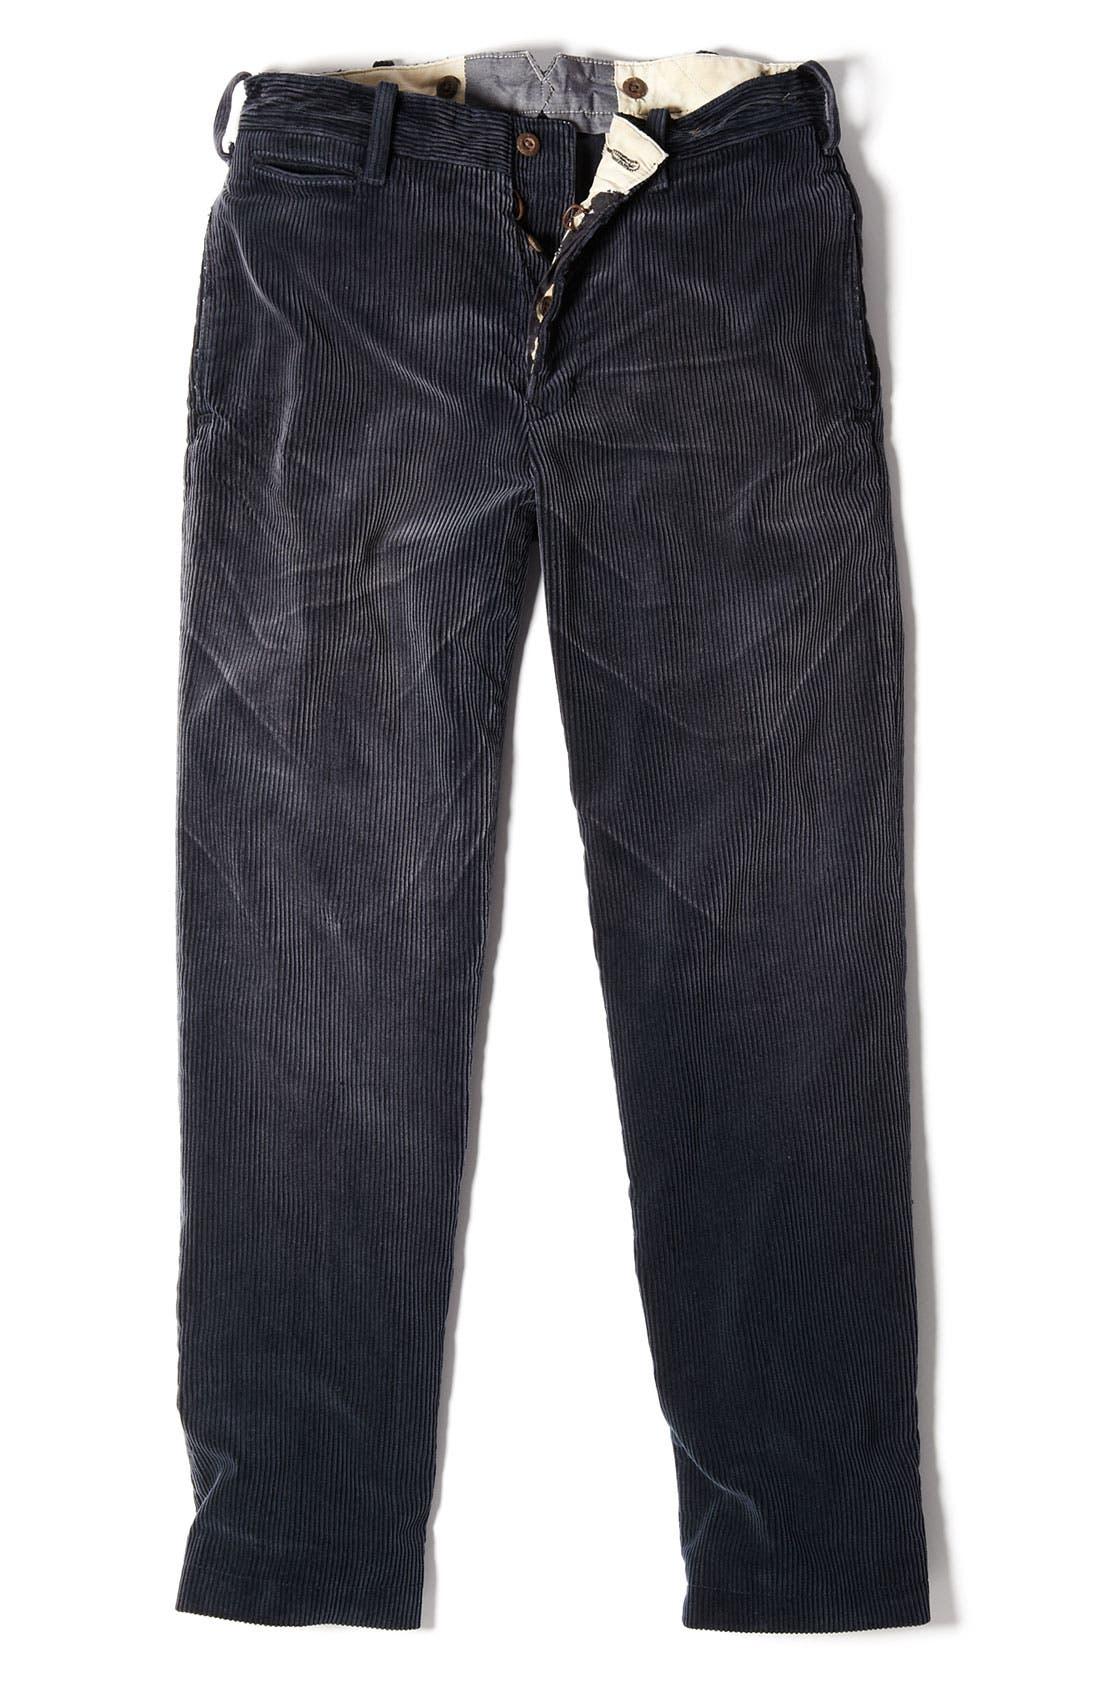 Alternate Image 4  - Polo Ralph Lauren 'Country' Corduroy Pants